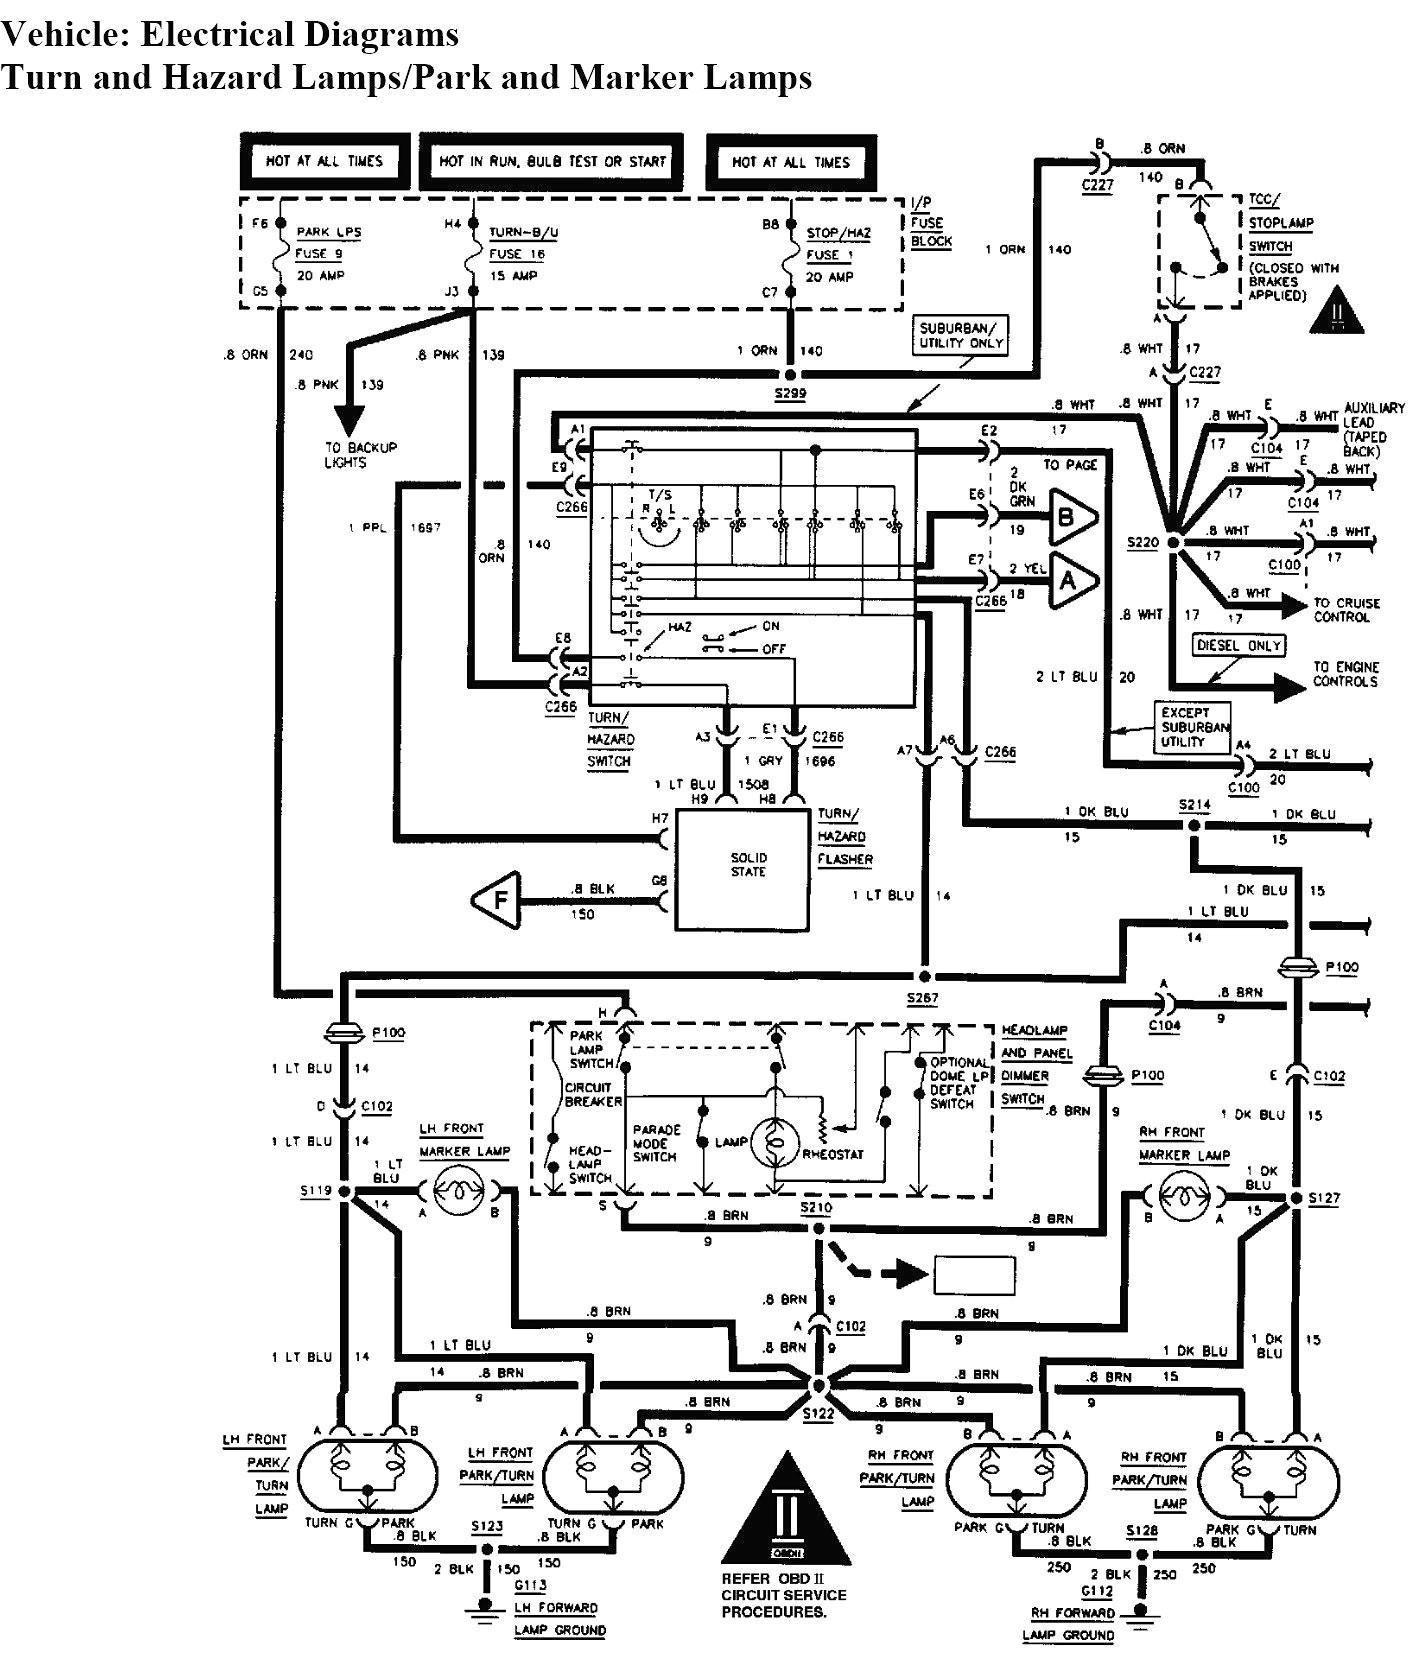 1998 Chevy Silverado Tail Light Wiring Diagram Chevy Silverado Tail Light Wiring Diagram Brake Manual New 1995 Of 1998 Chevy Silverado Tail Light Wiring Diagram